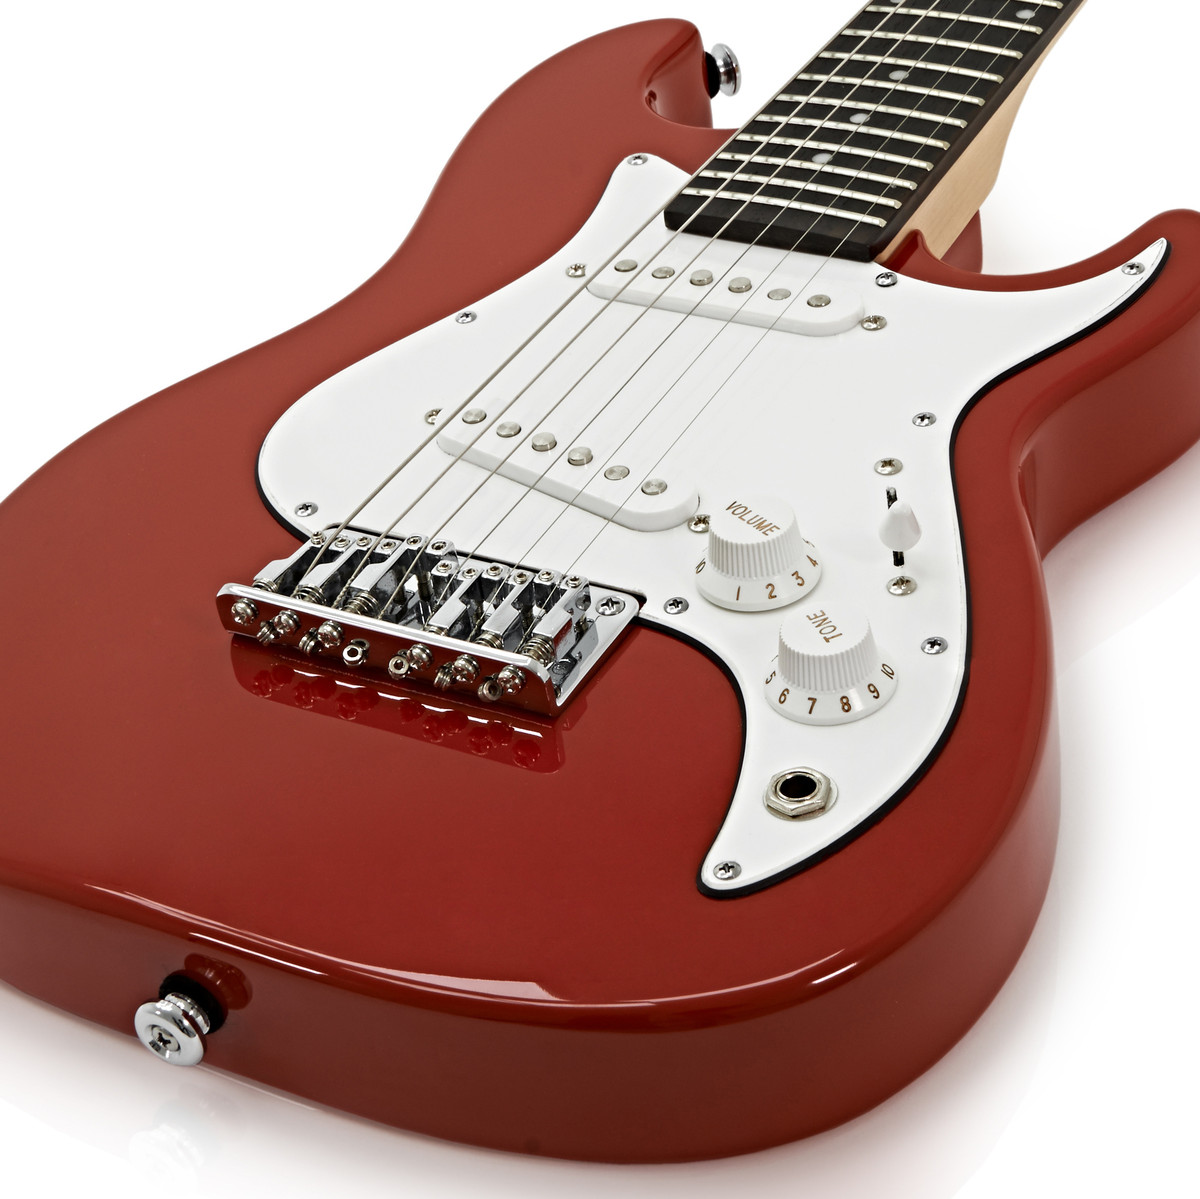 greg bennett malibu mmb 1 mini electric guitar red at. Black Bedroom Furniture Sets. Home Design Ideas